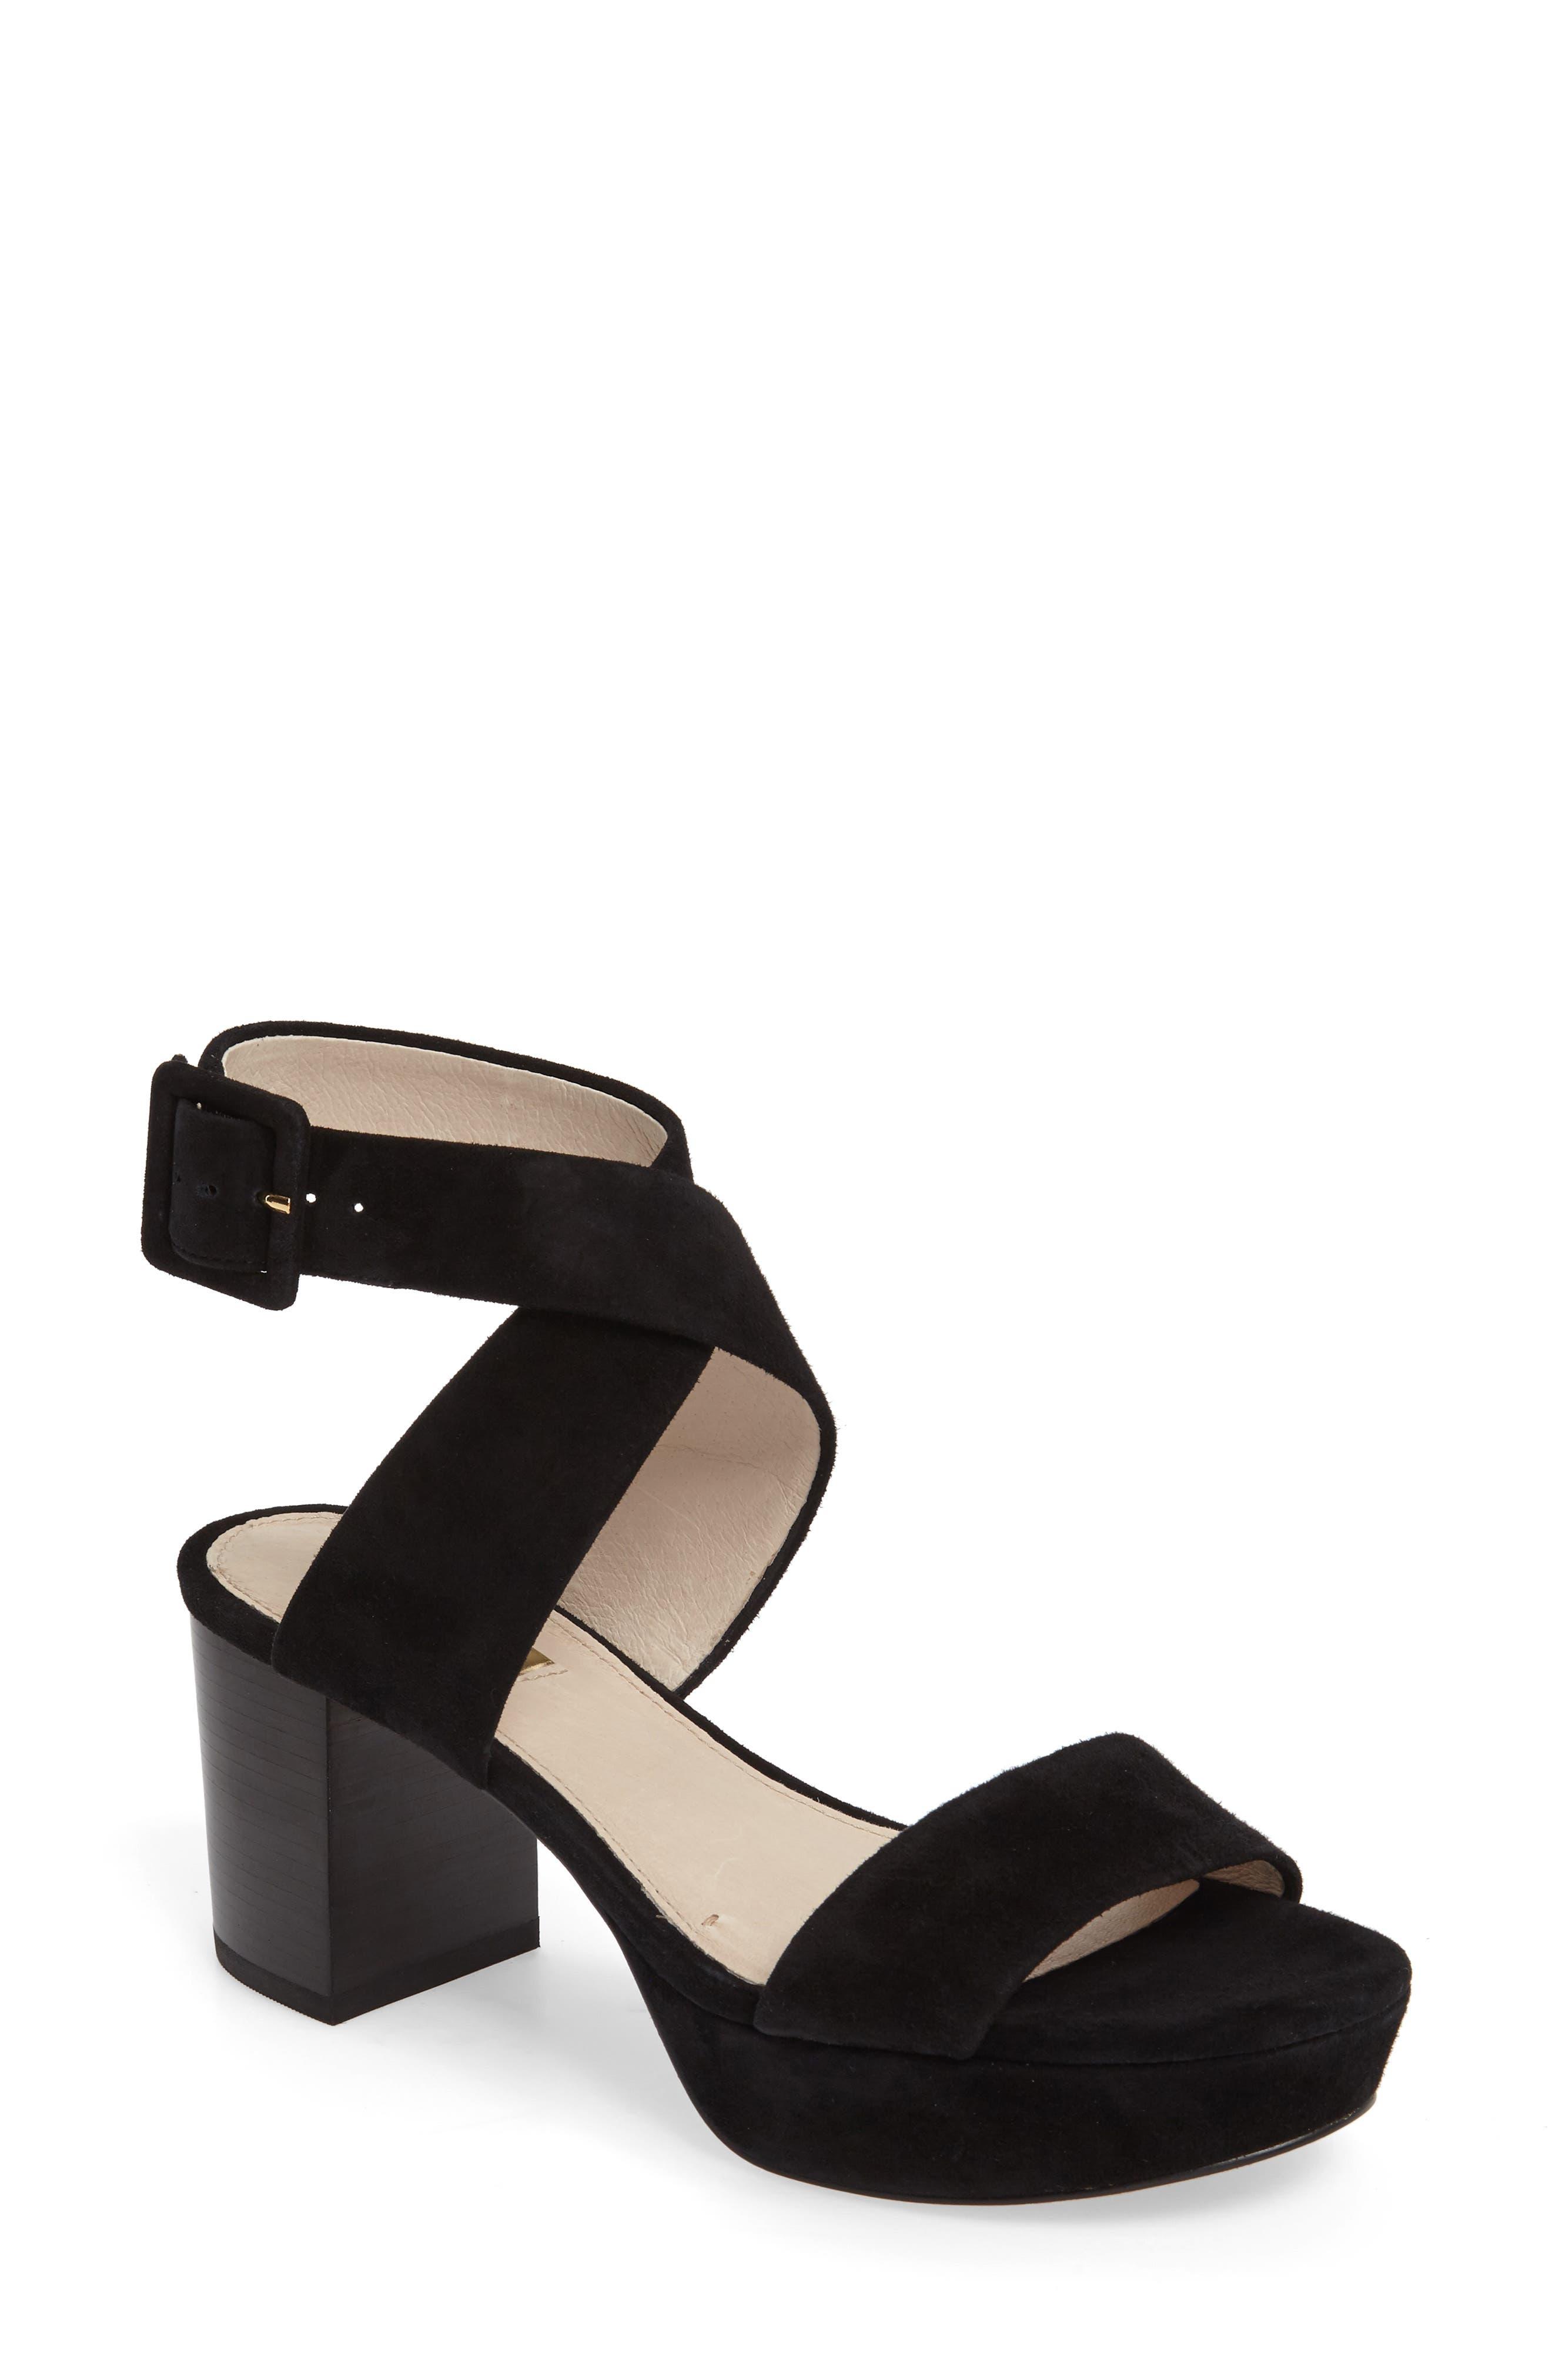 LOUISE ET CIE Harmony Block Heel Sandal